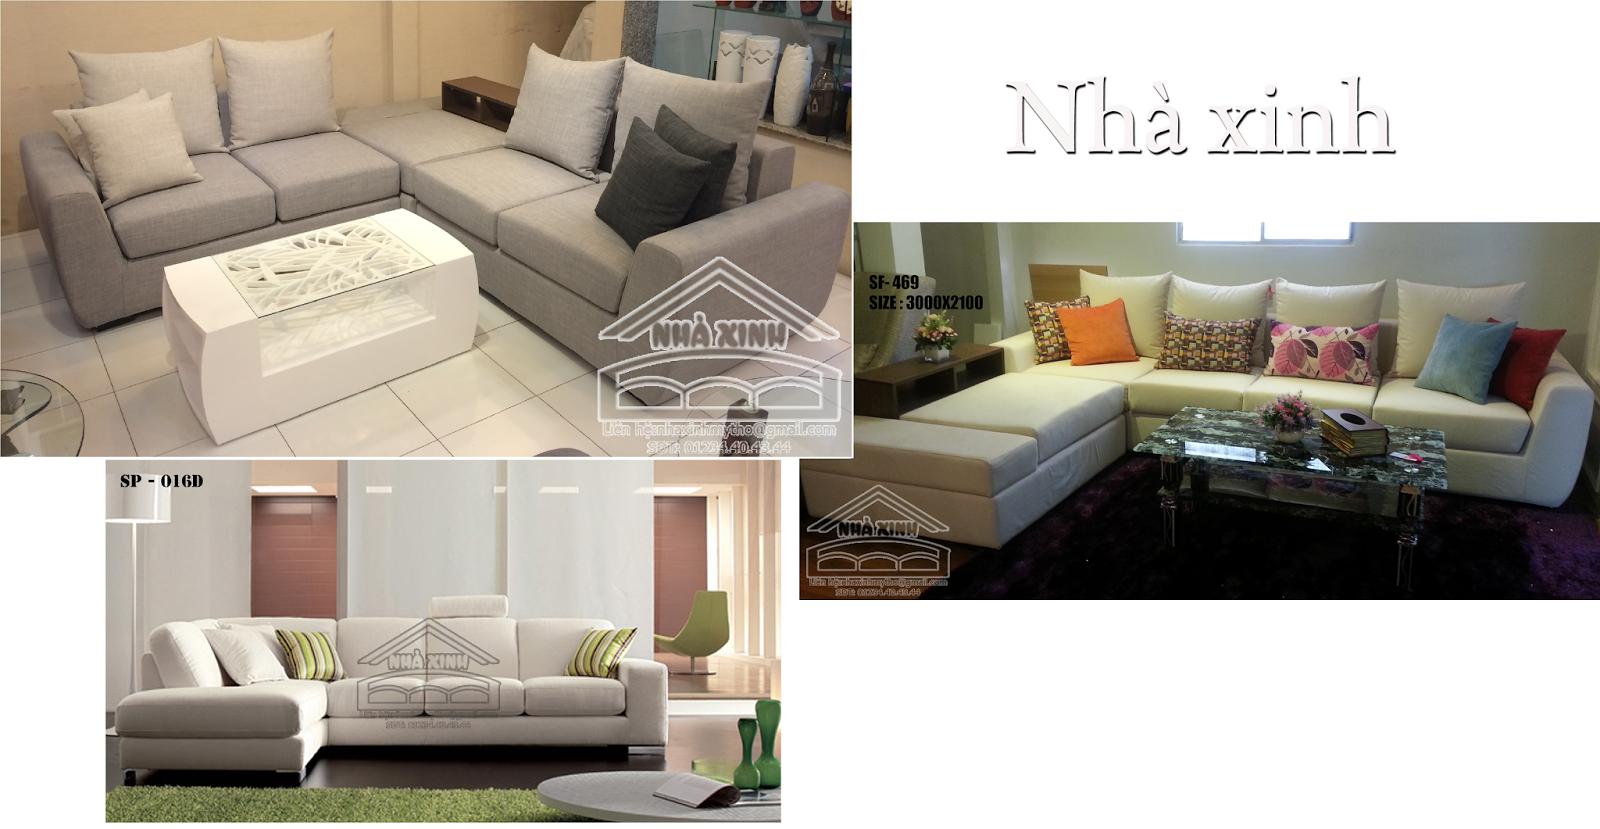 Sofa g c nh xinh m tho sfnx 469 016d for Sofa bed nha xinh